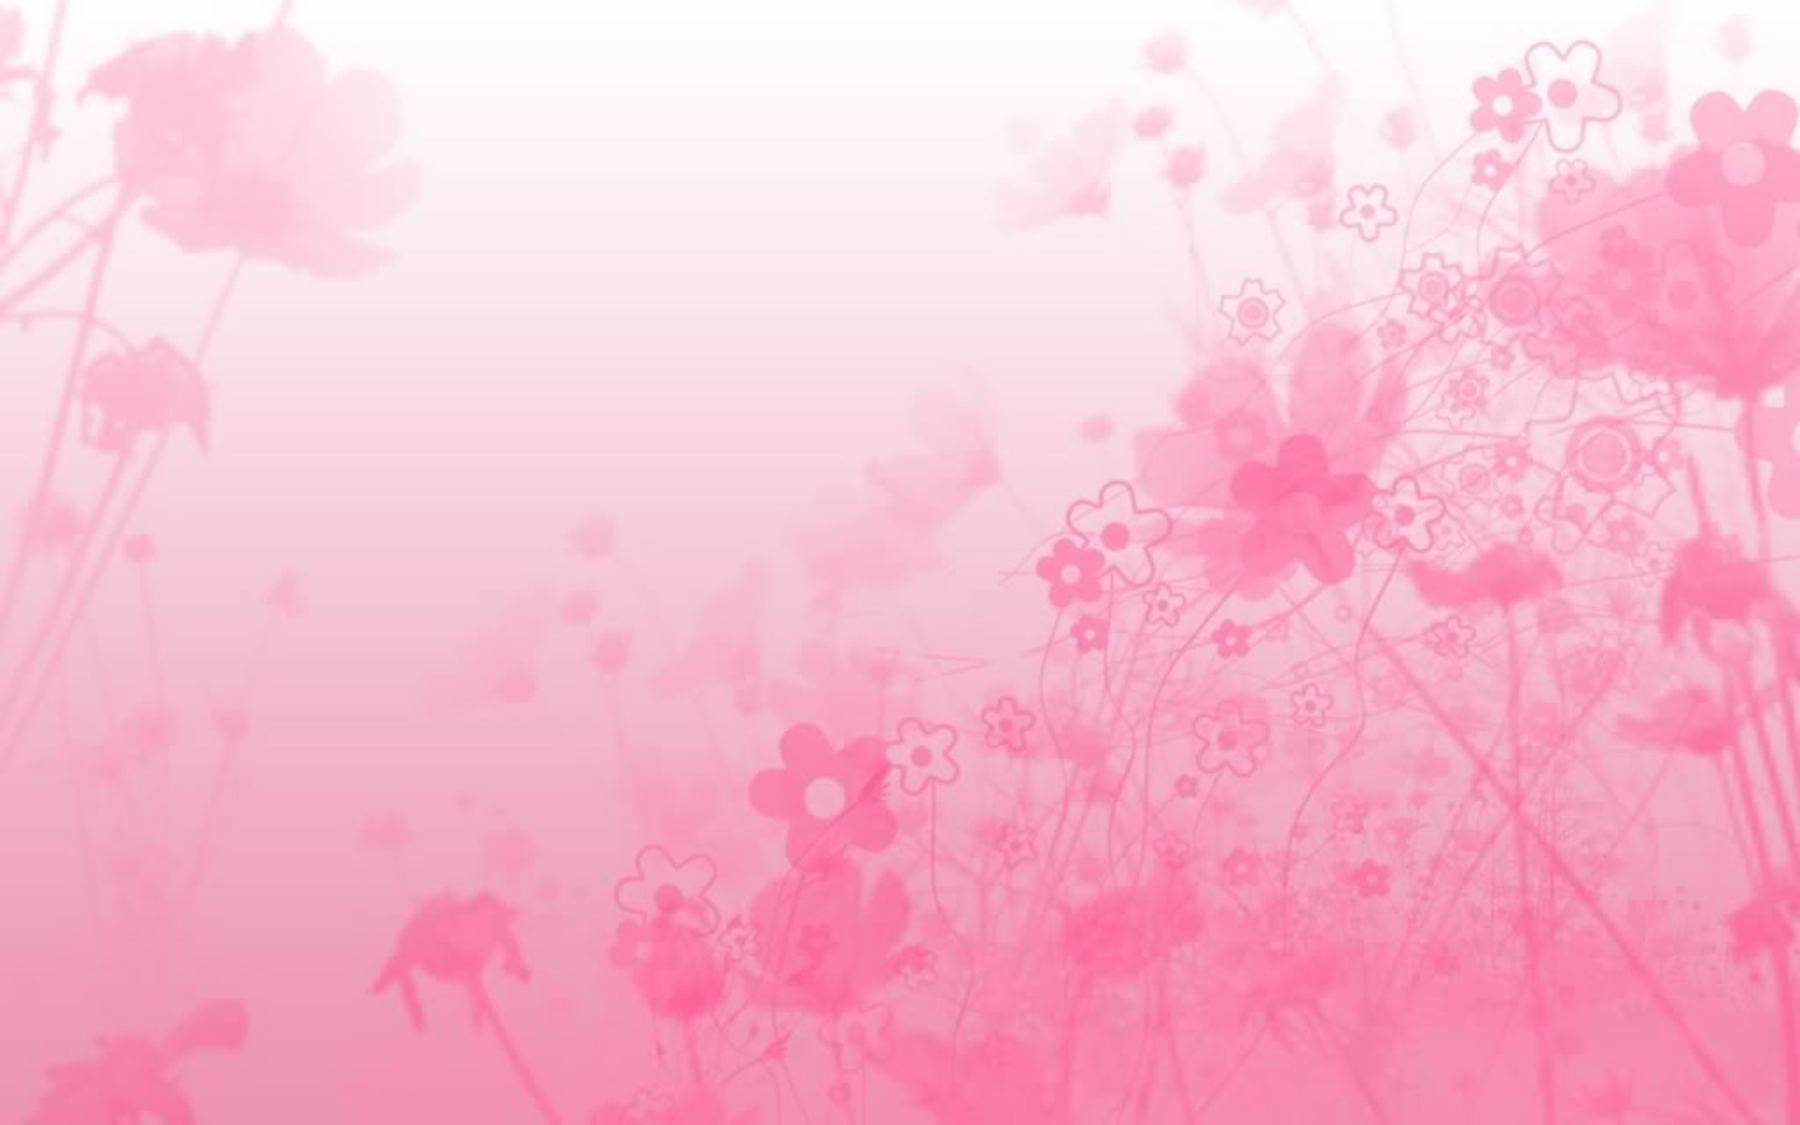 Popular Wallpaper Marble Hot Pink - pink-abstract-flower-x-sch-ne-rosa-blume-80229  Image_42398.jpg